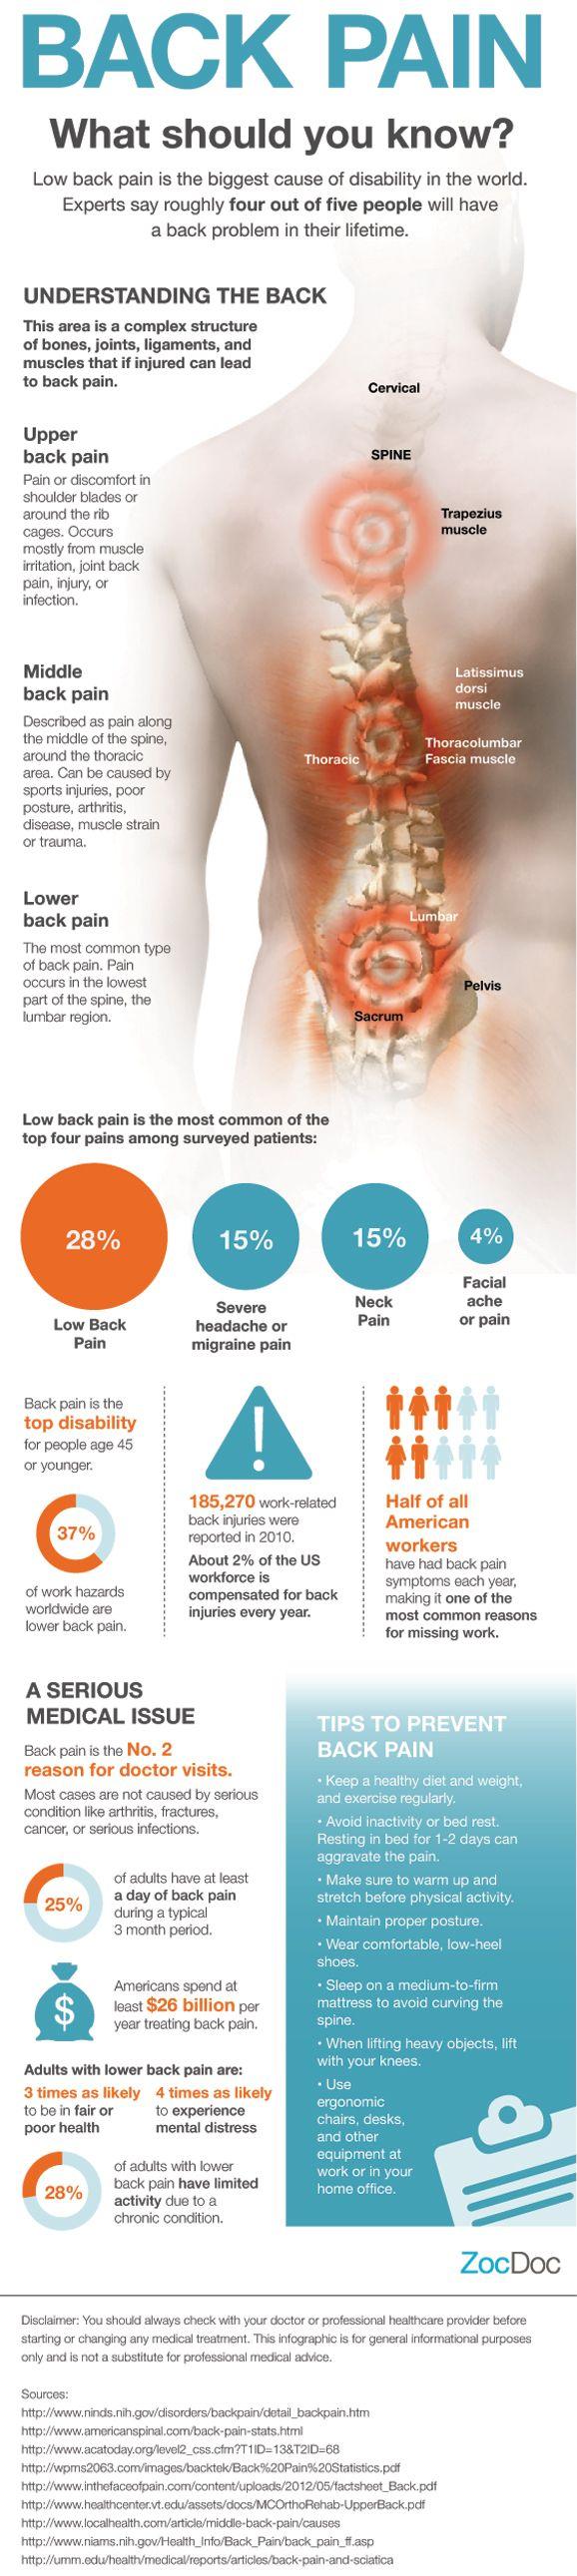 Infographic: Back Pain 101 — Shutterbug Seshatwww.SELLaBIZ.gr ΠΩΛΗΣΕΙΣ ΕΠΙΧΕΙΡΗΣΕΩΝ ΔΩΡΕΑΝ ΑΓΓΕΛΙΕΣ ΠΩΛΗΣΗΣ ΕΠΙΧΕΙΡΗΣΗΣ BUSINESS FOR SALE FREE OF CHARGE PUBLICATION